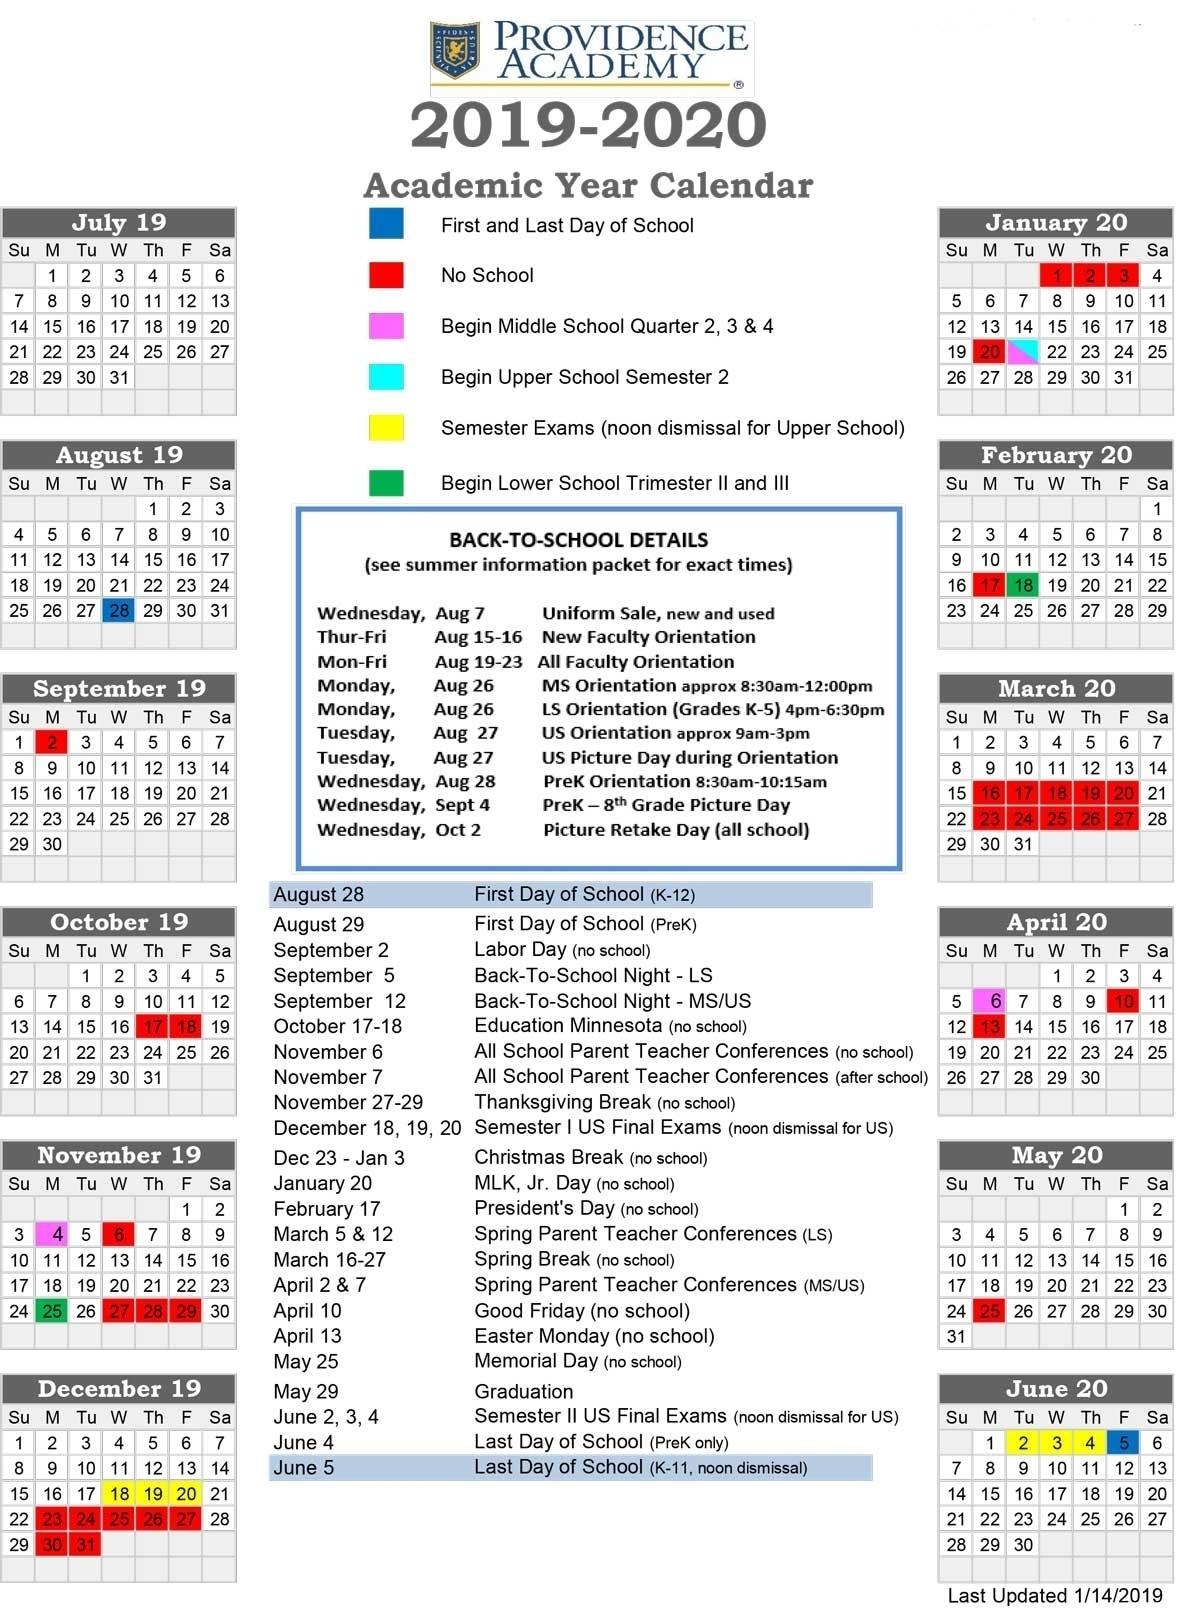 U Of M Calendar 2019-2020 School Year | Calendar Template within U Of M 2019 2020 Calendar